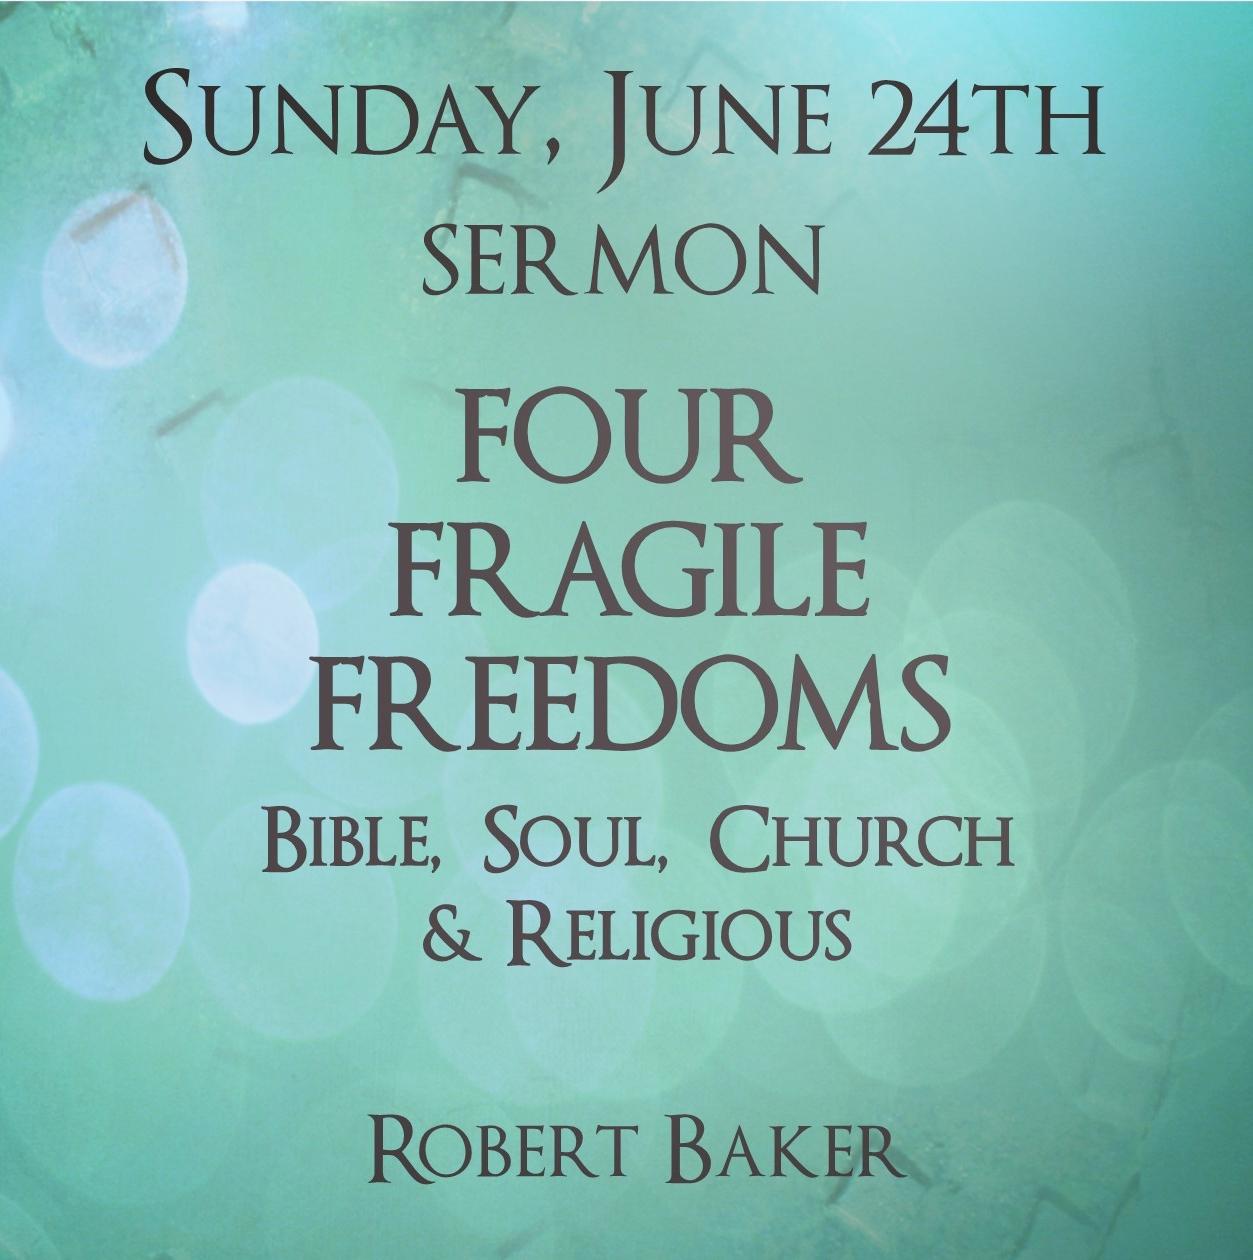 Sermon Four Fragile  Facebook Link Pos 600t 062418.jpg